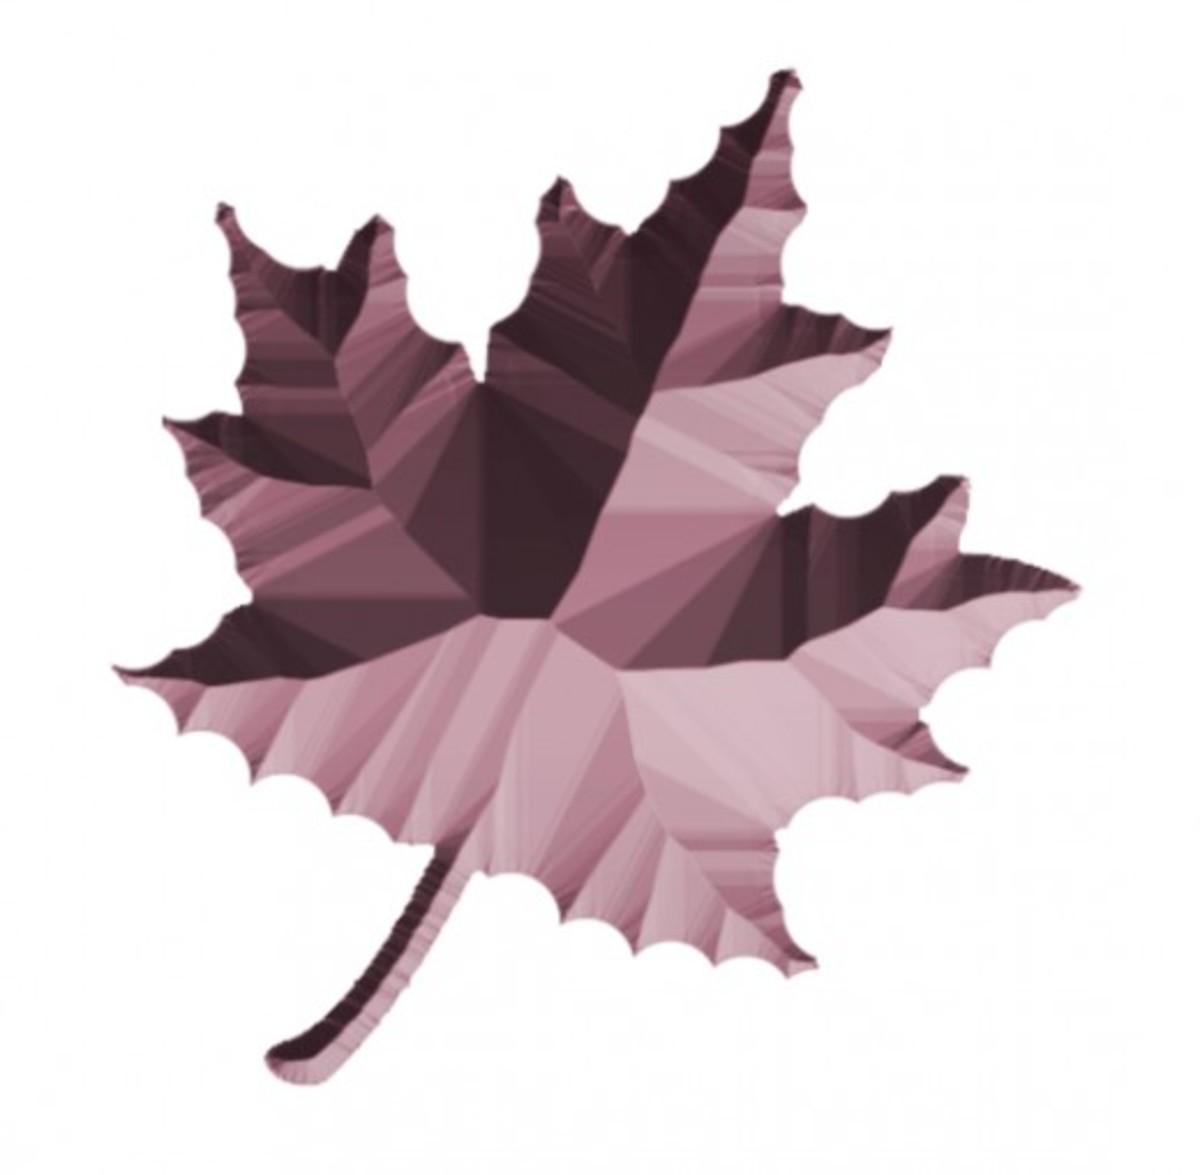 Textured foliage 5.